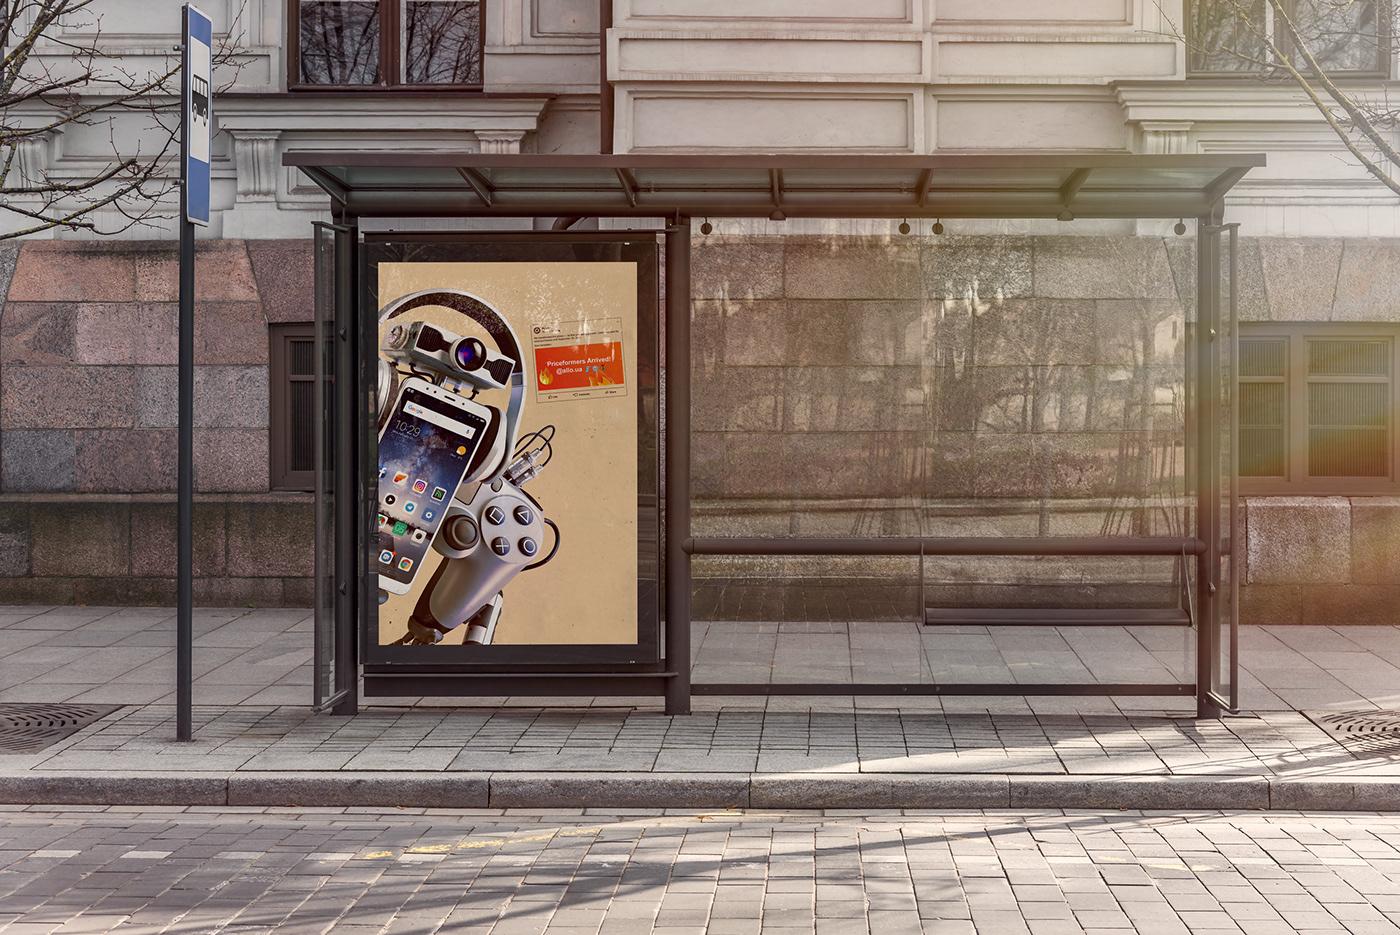 Transformers Electronics ukraine sale Promotion